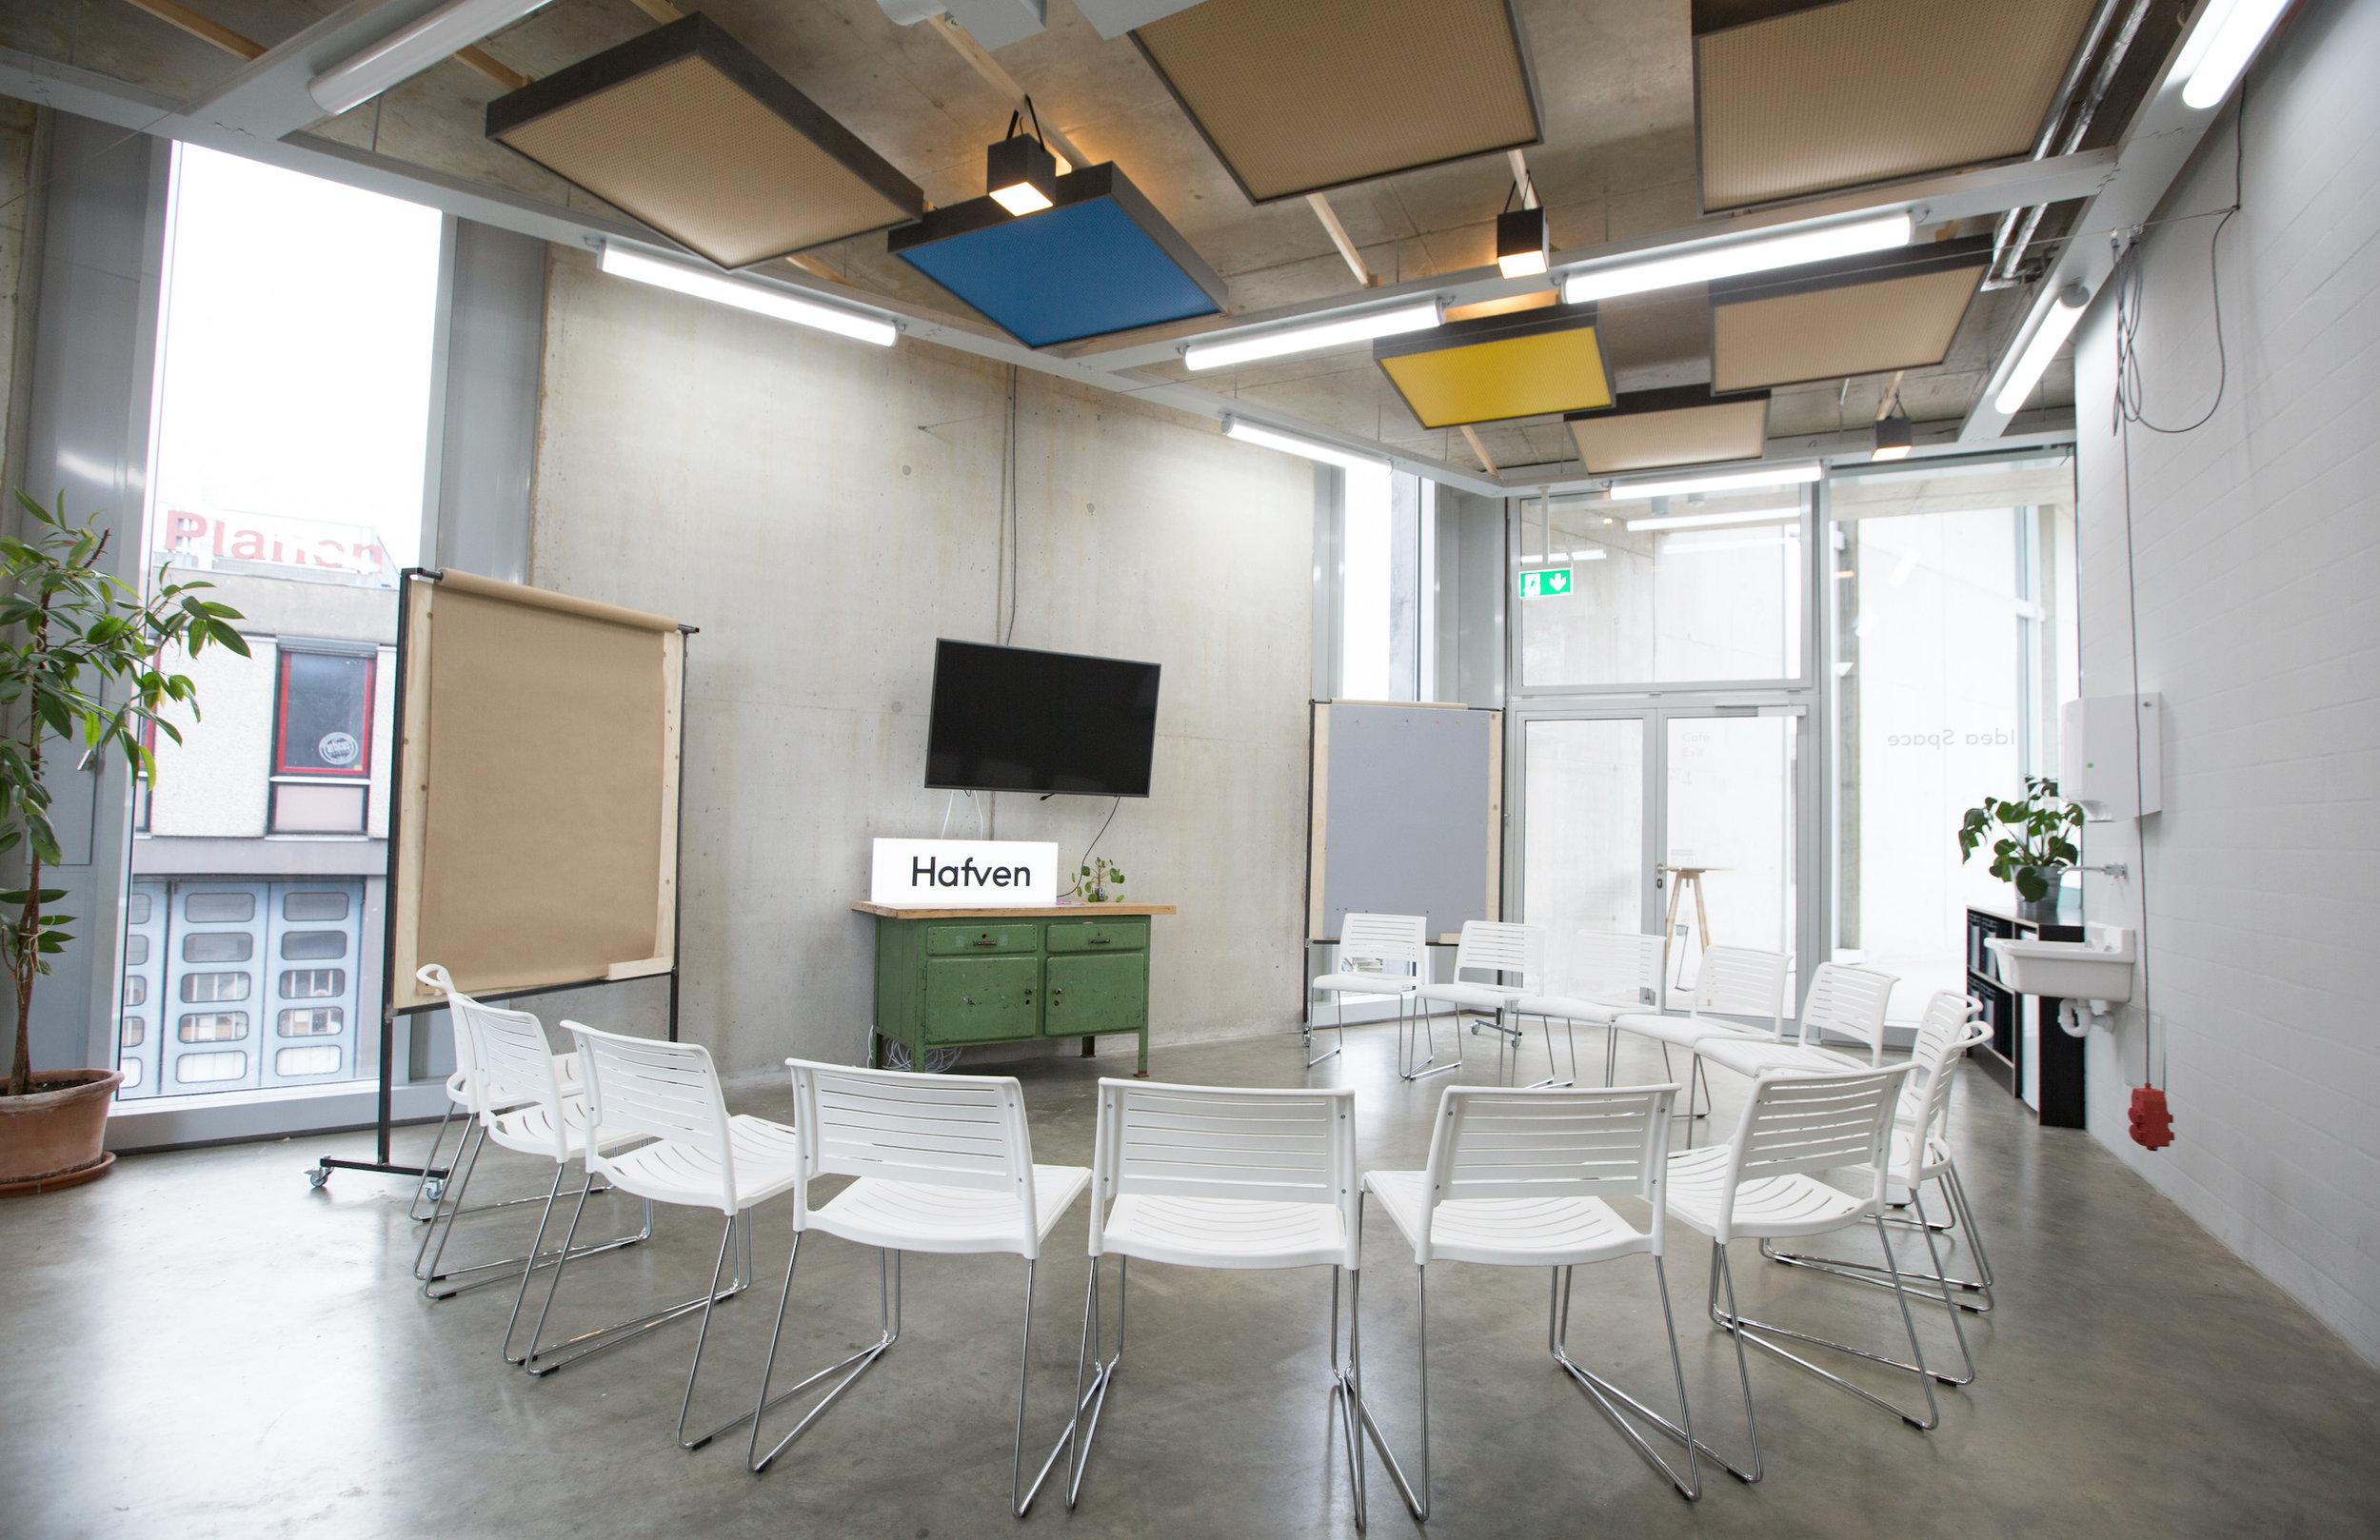 Foto: Hafven Idea Space